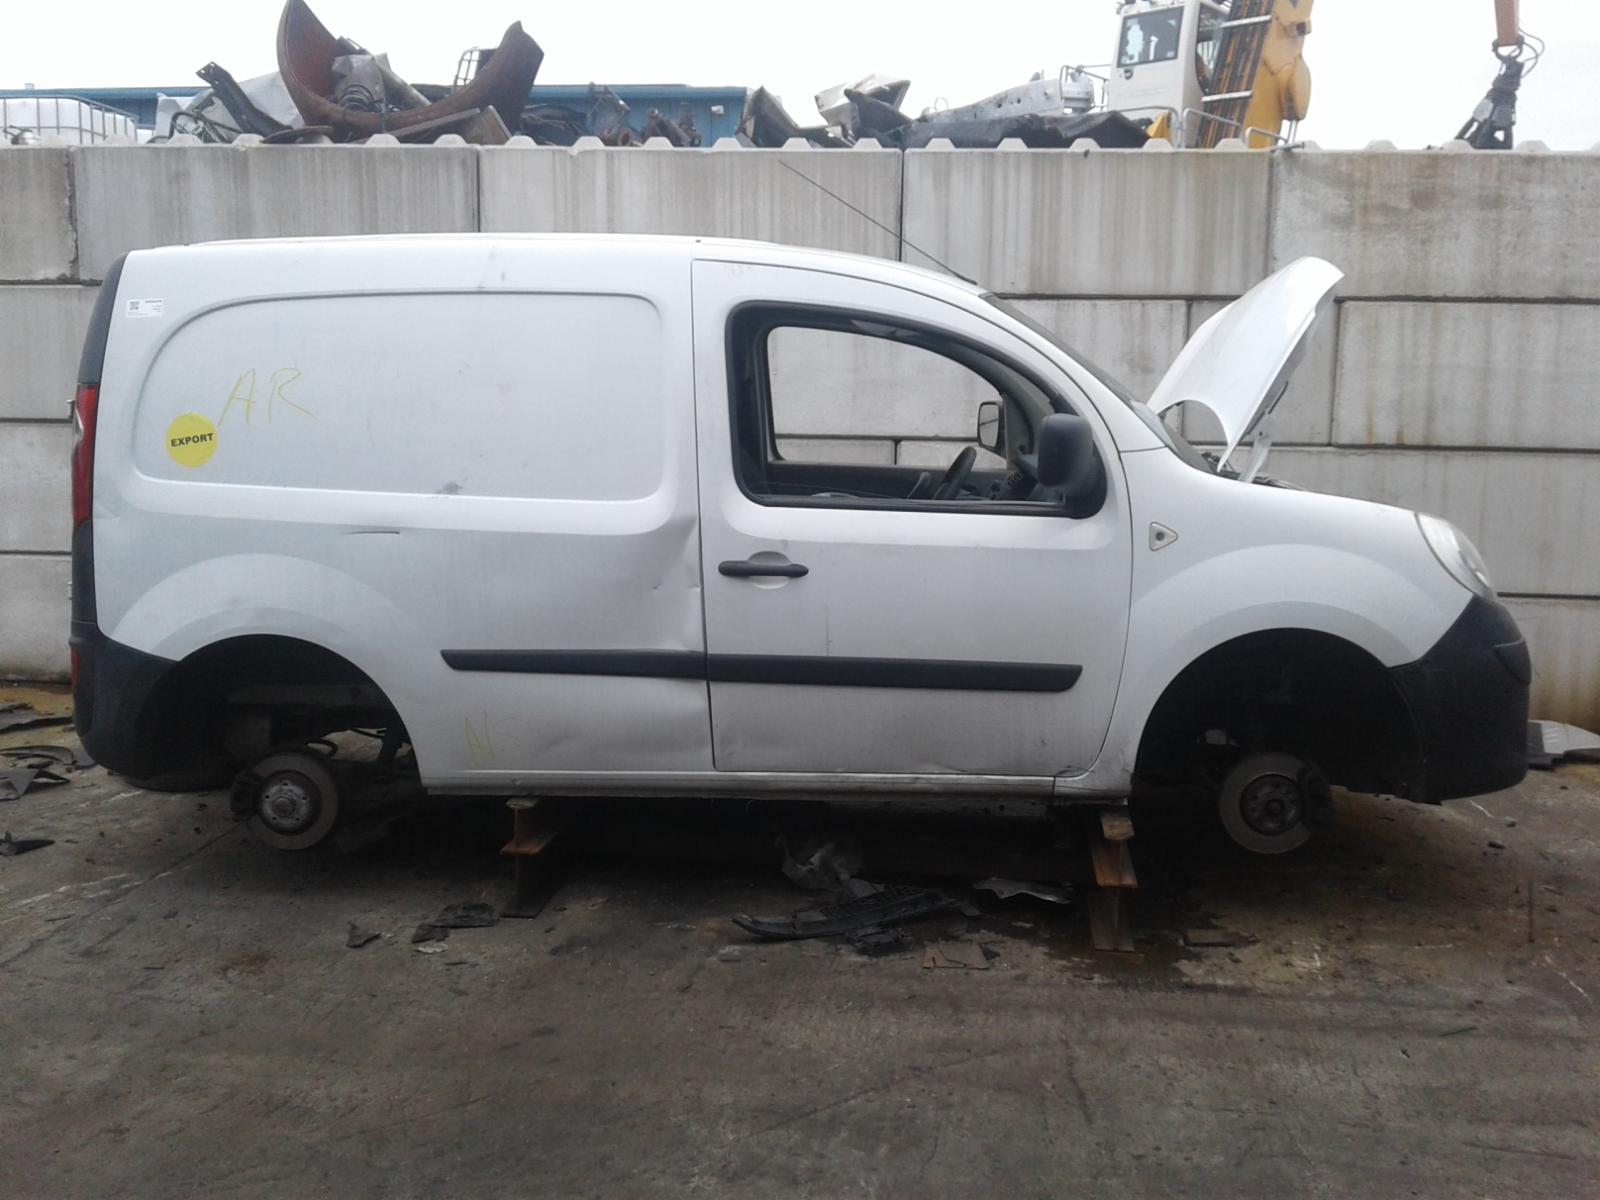 Image for a RENAULT KANGOO 2010 Unknown Van